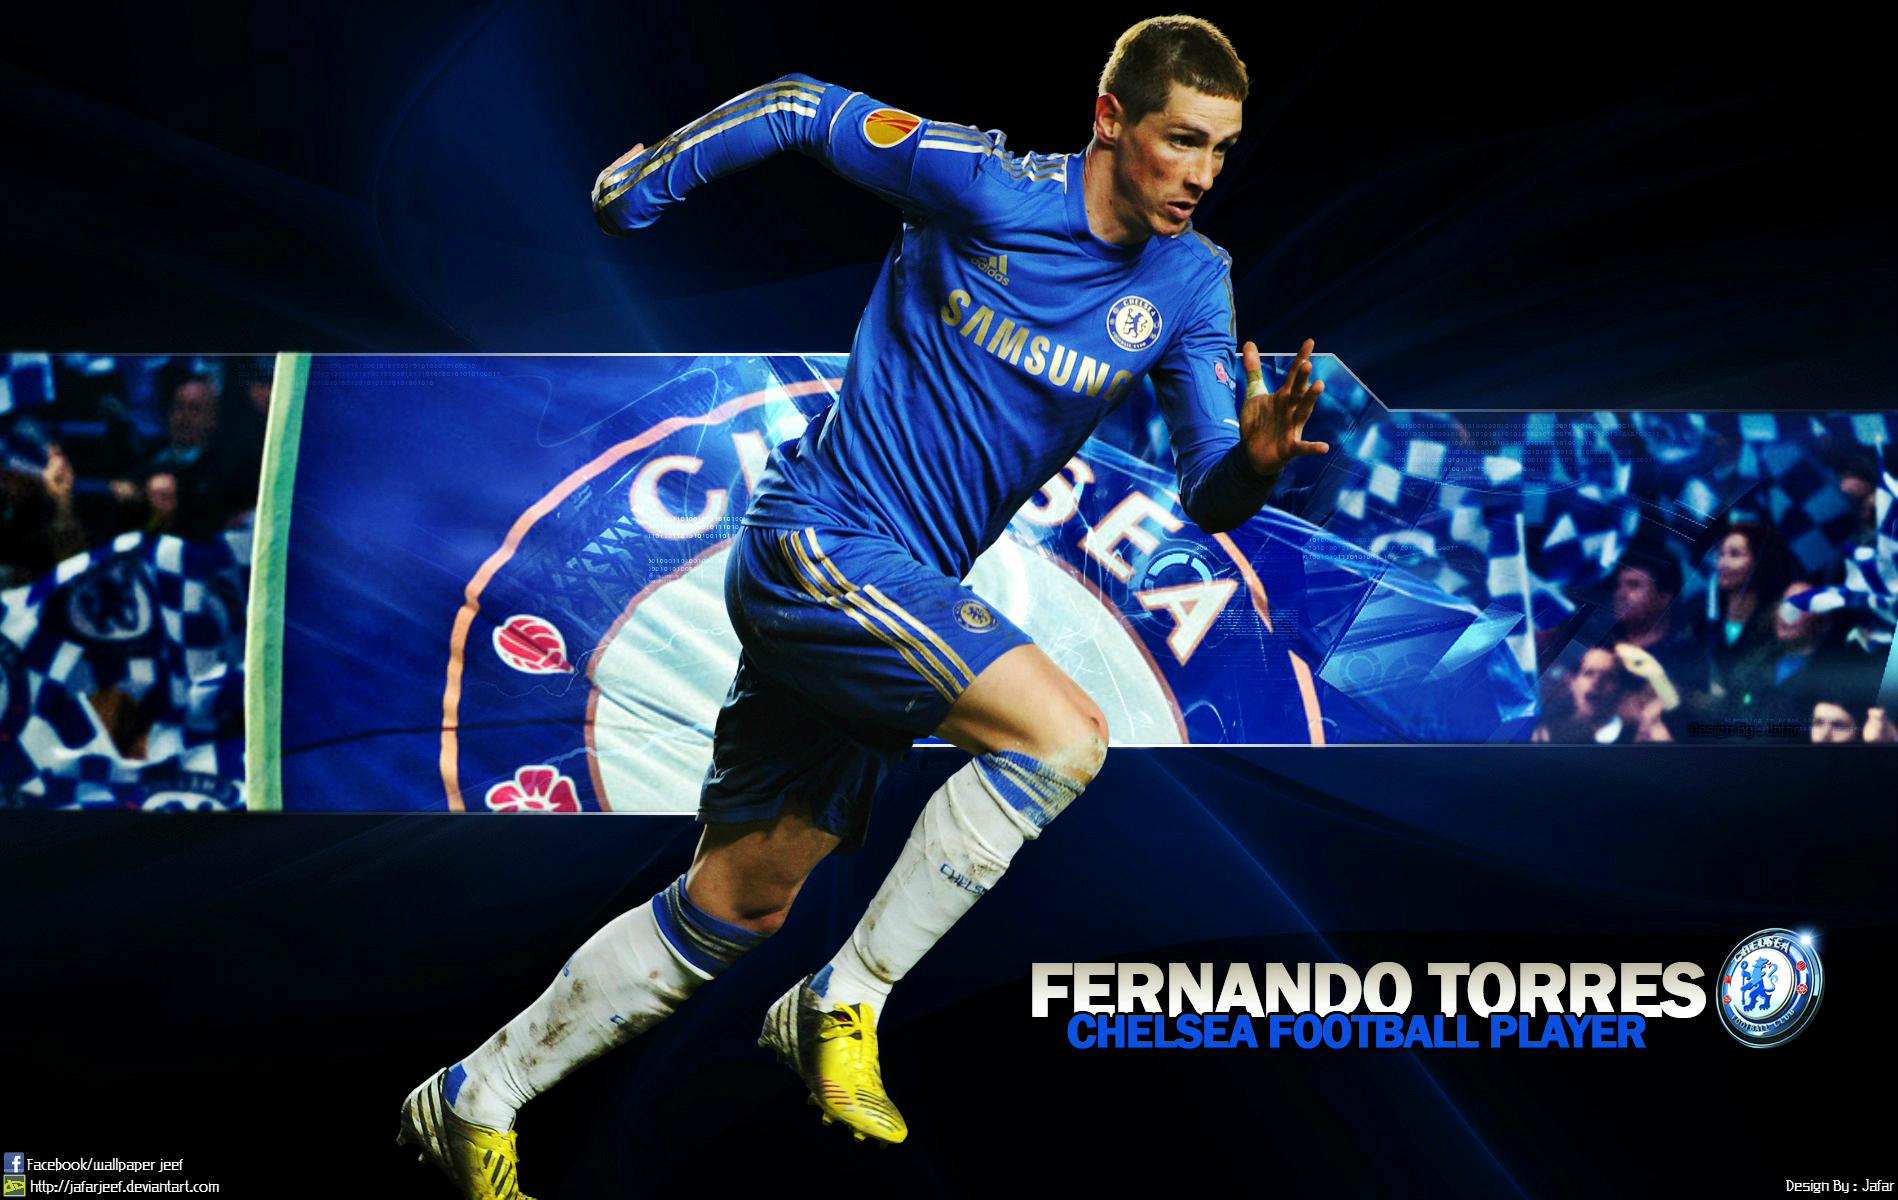 Fernando Torres Desktop Wallpaper   Football Wallpaper HD Football 1898x1200